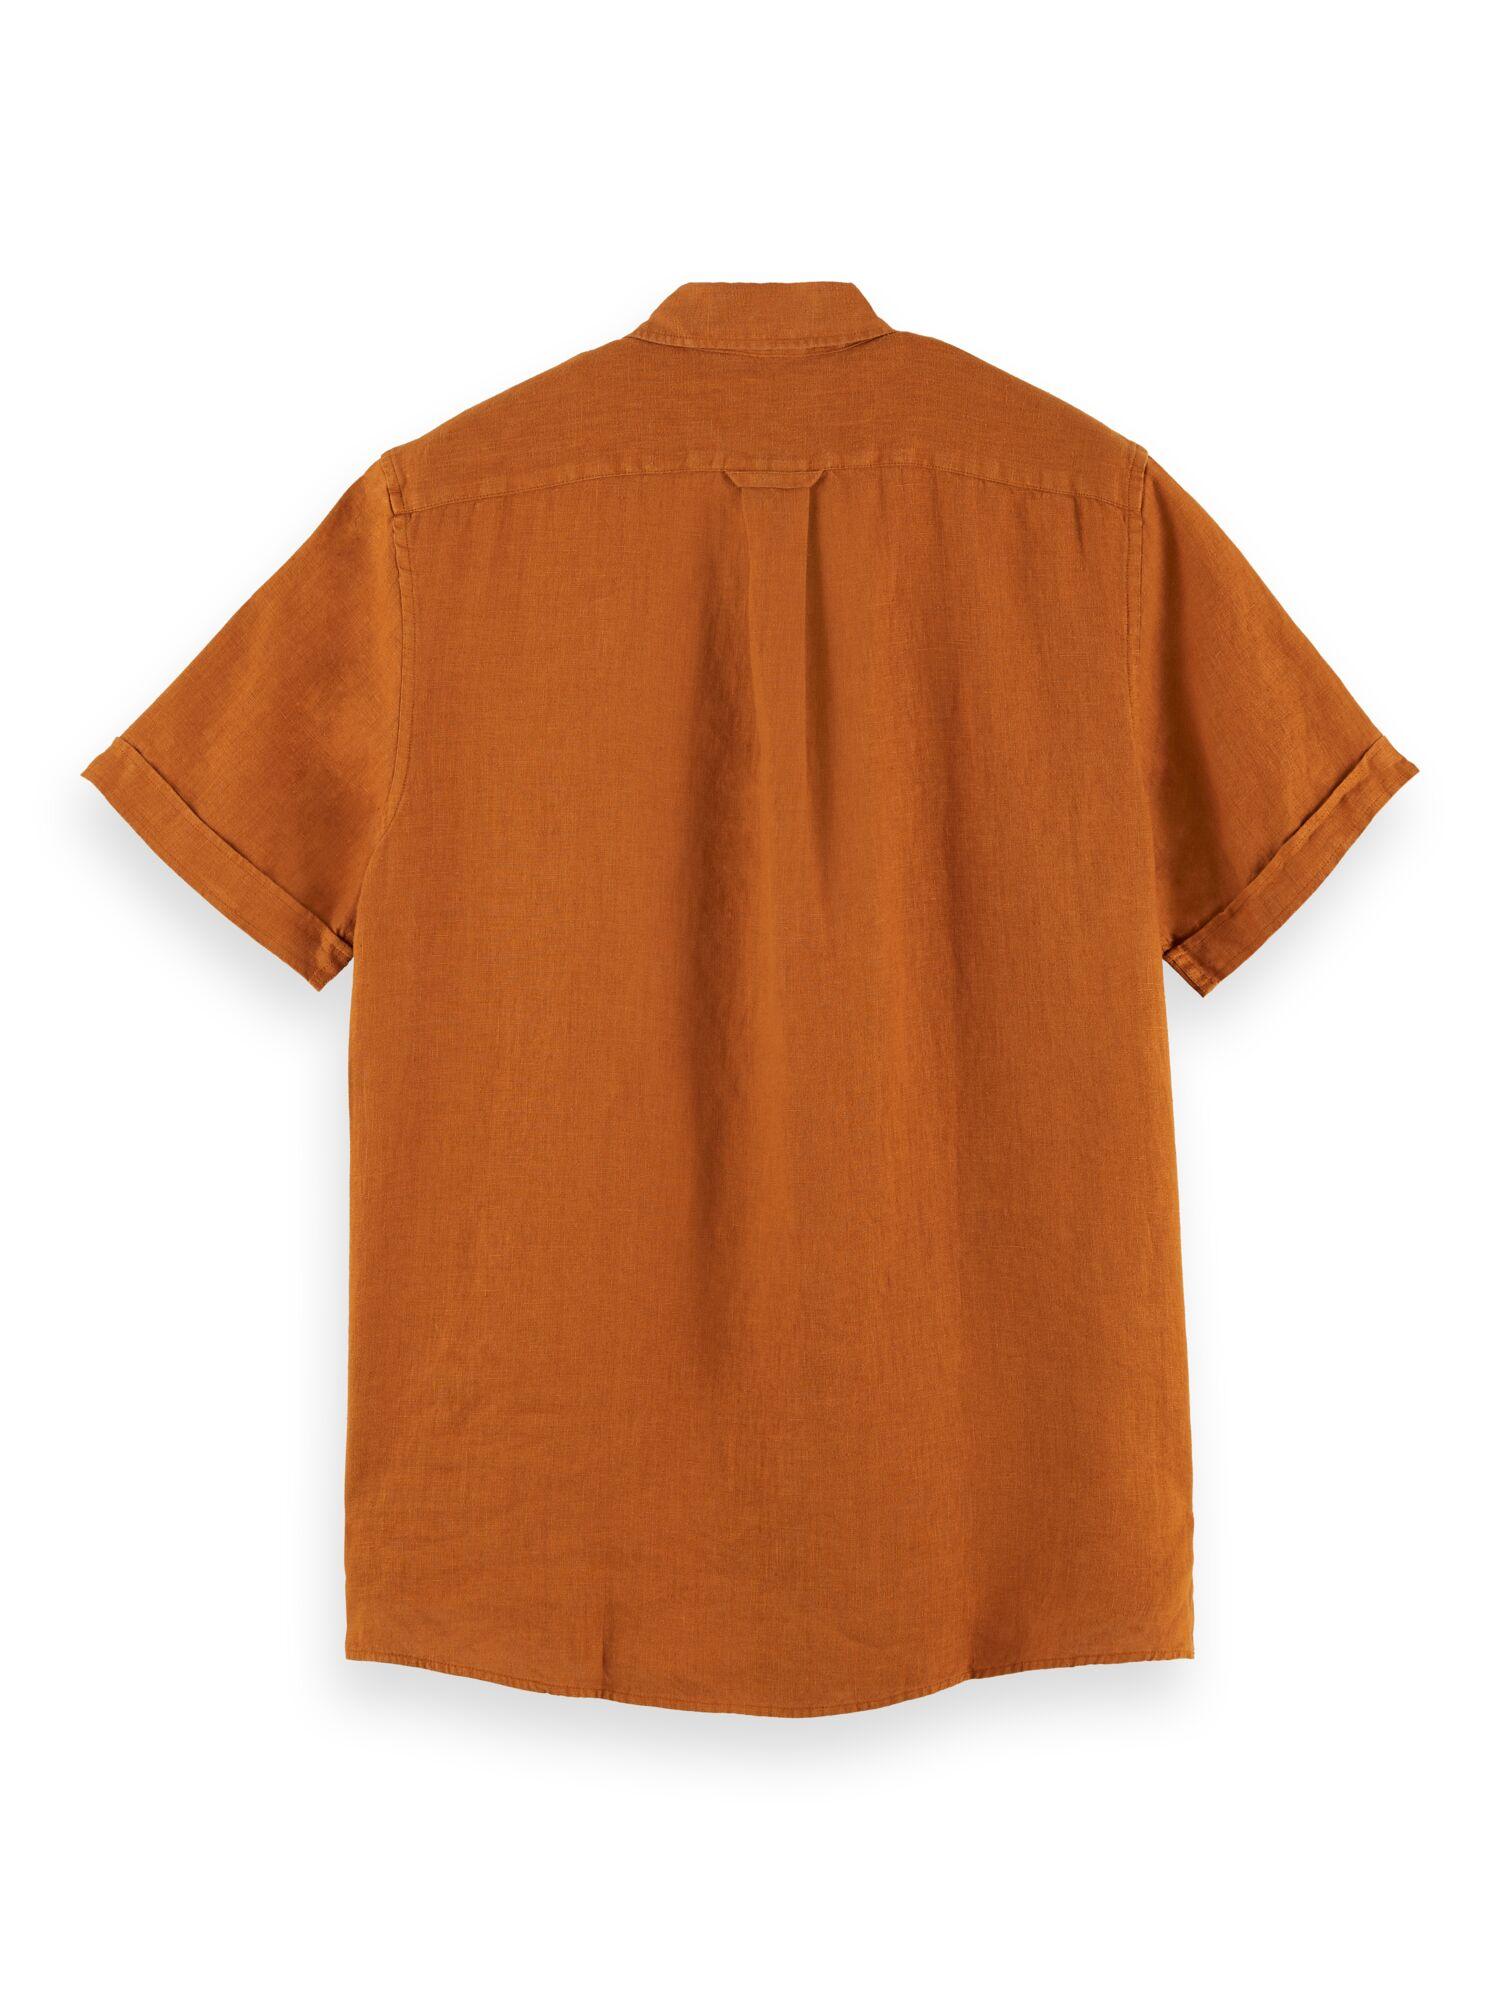 Scotch & Soda | REGULAR FIT- Classic short sleeve shirt